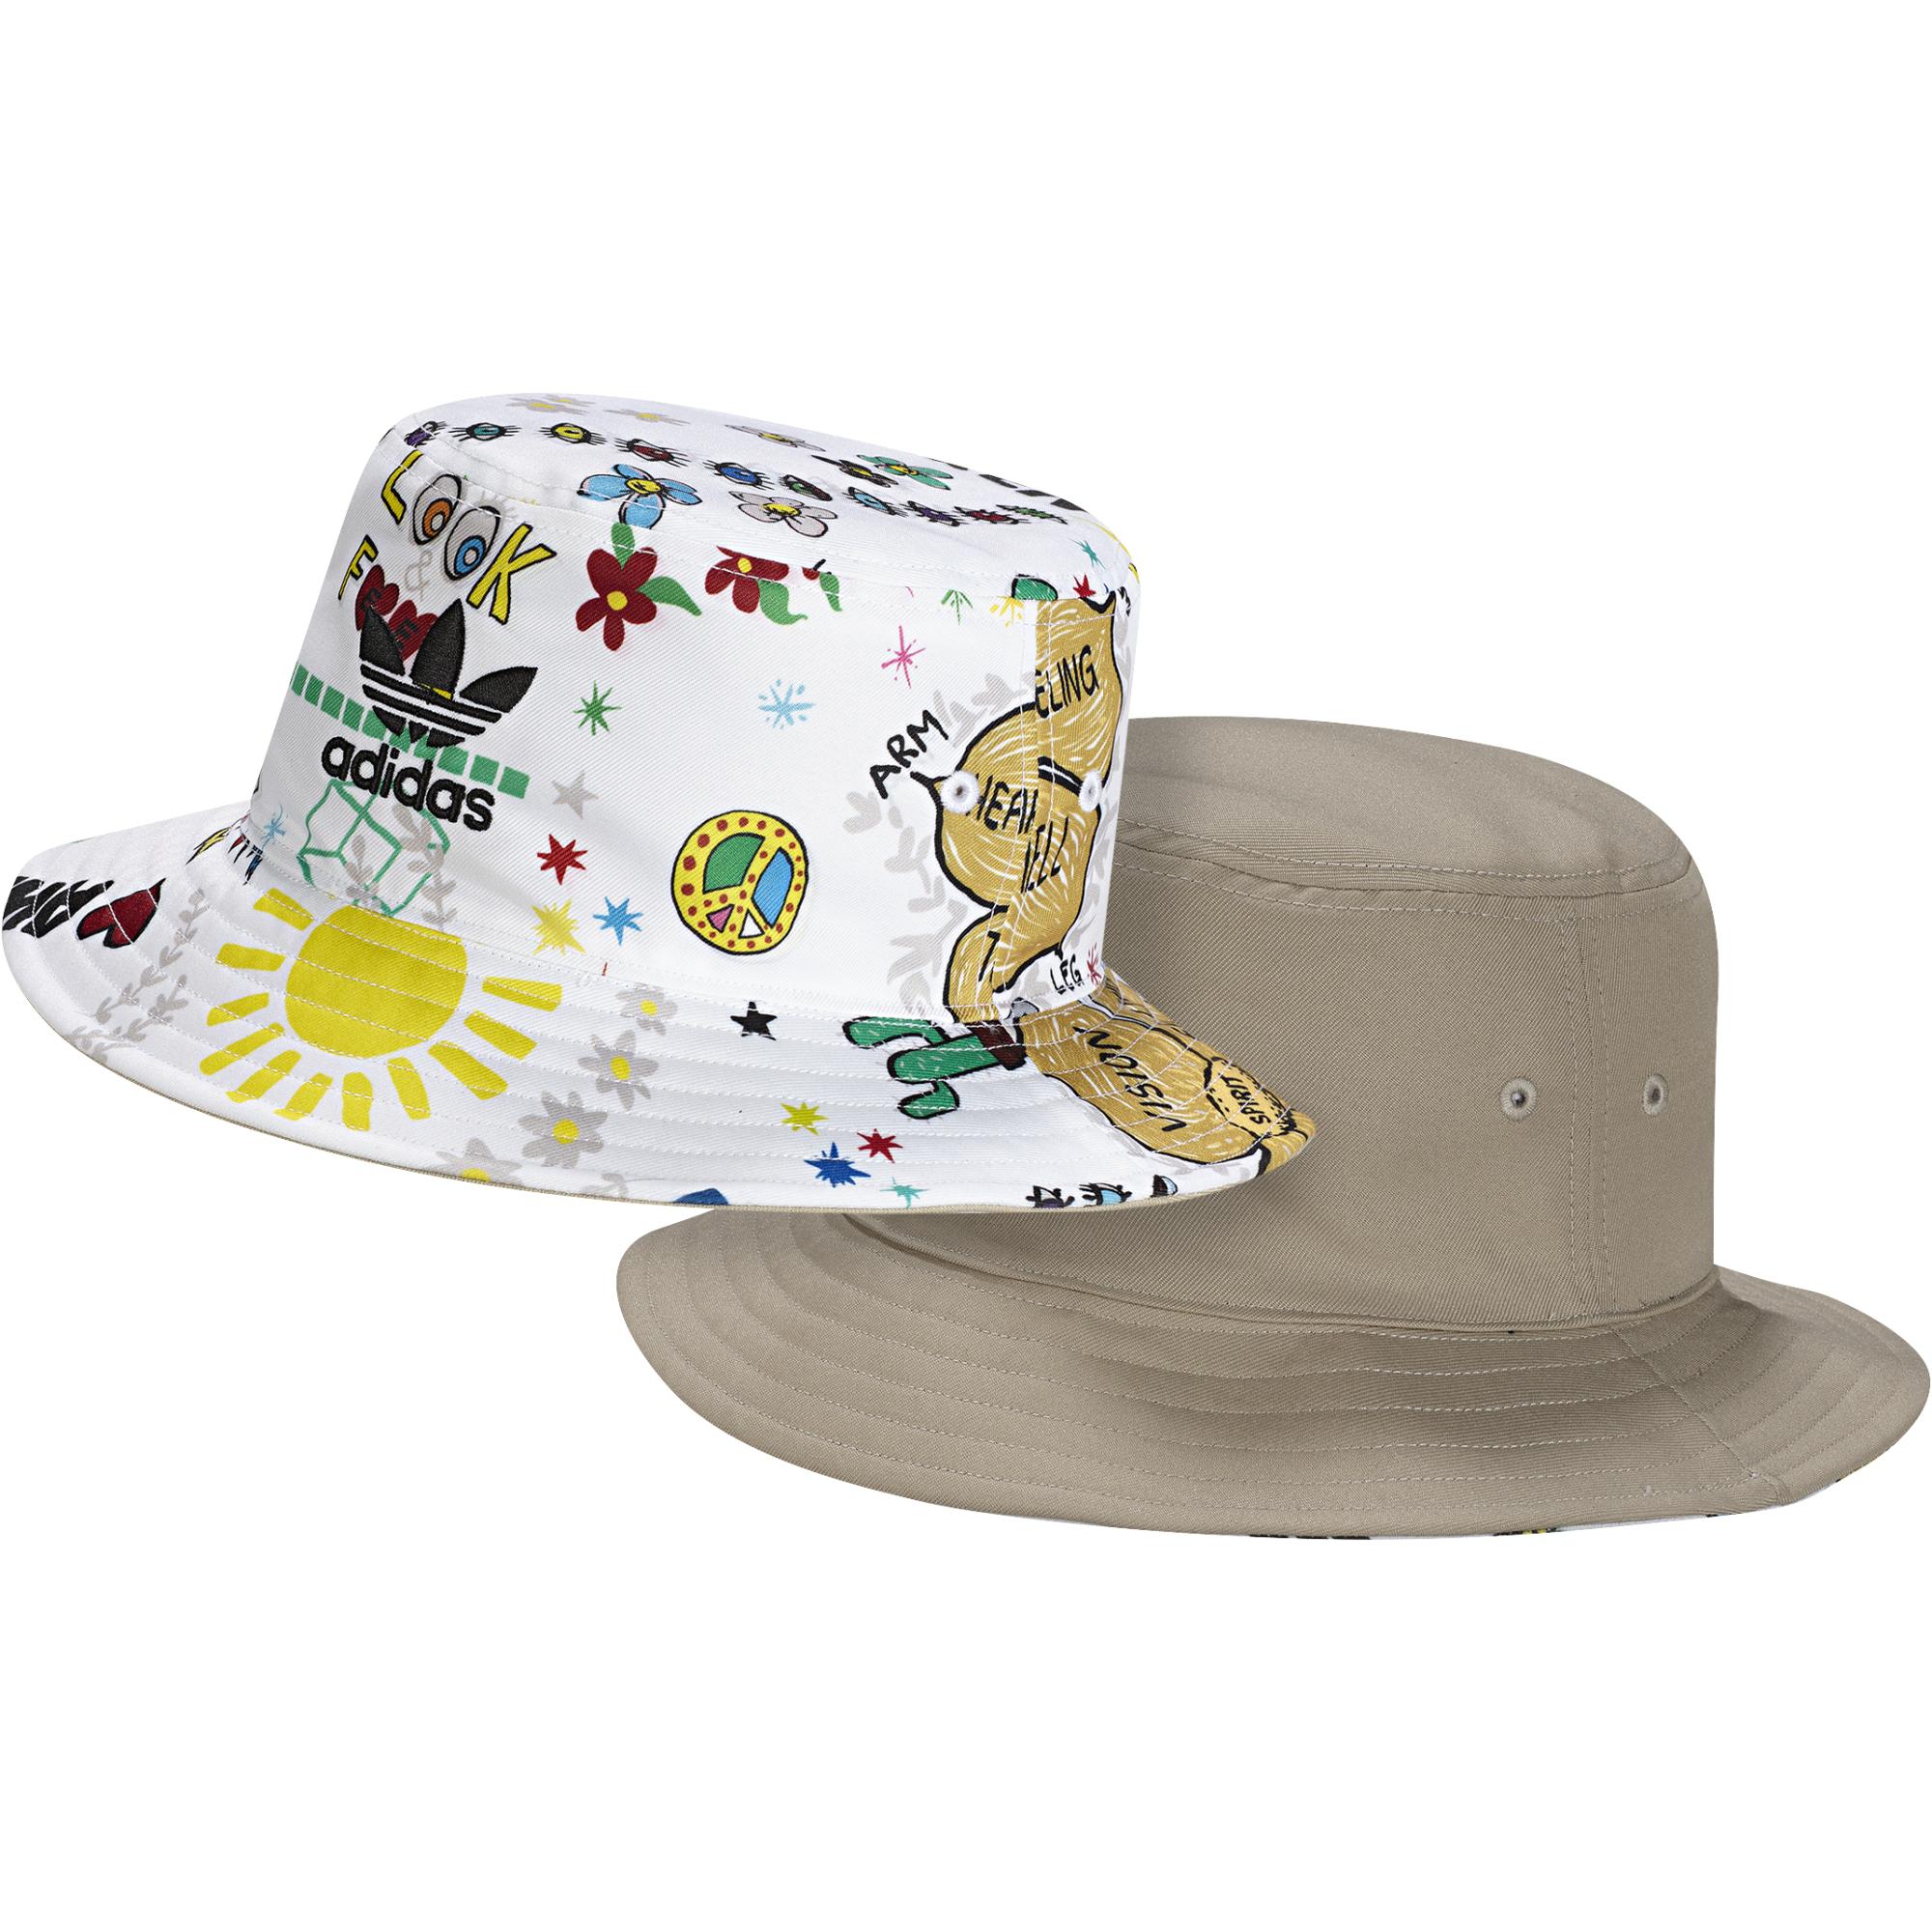 best sneakers ddd09 ad168 Adidas Originals Artist Bucket Hat Reversible Pharrell Williams (multicolor)